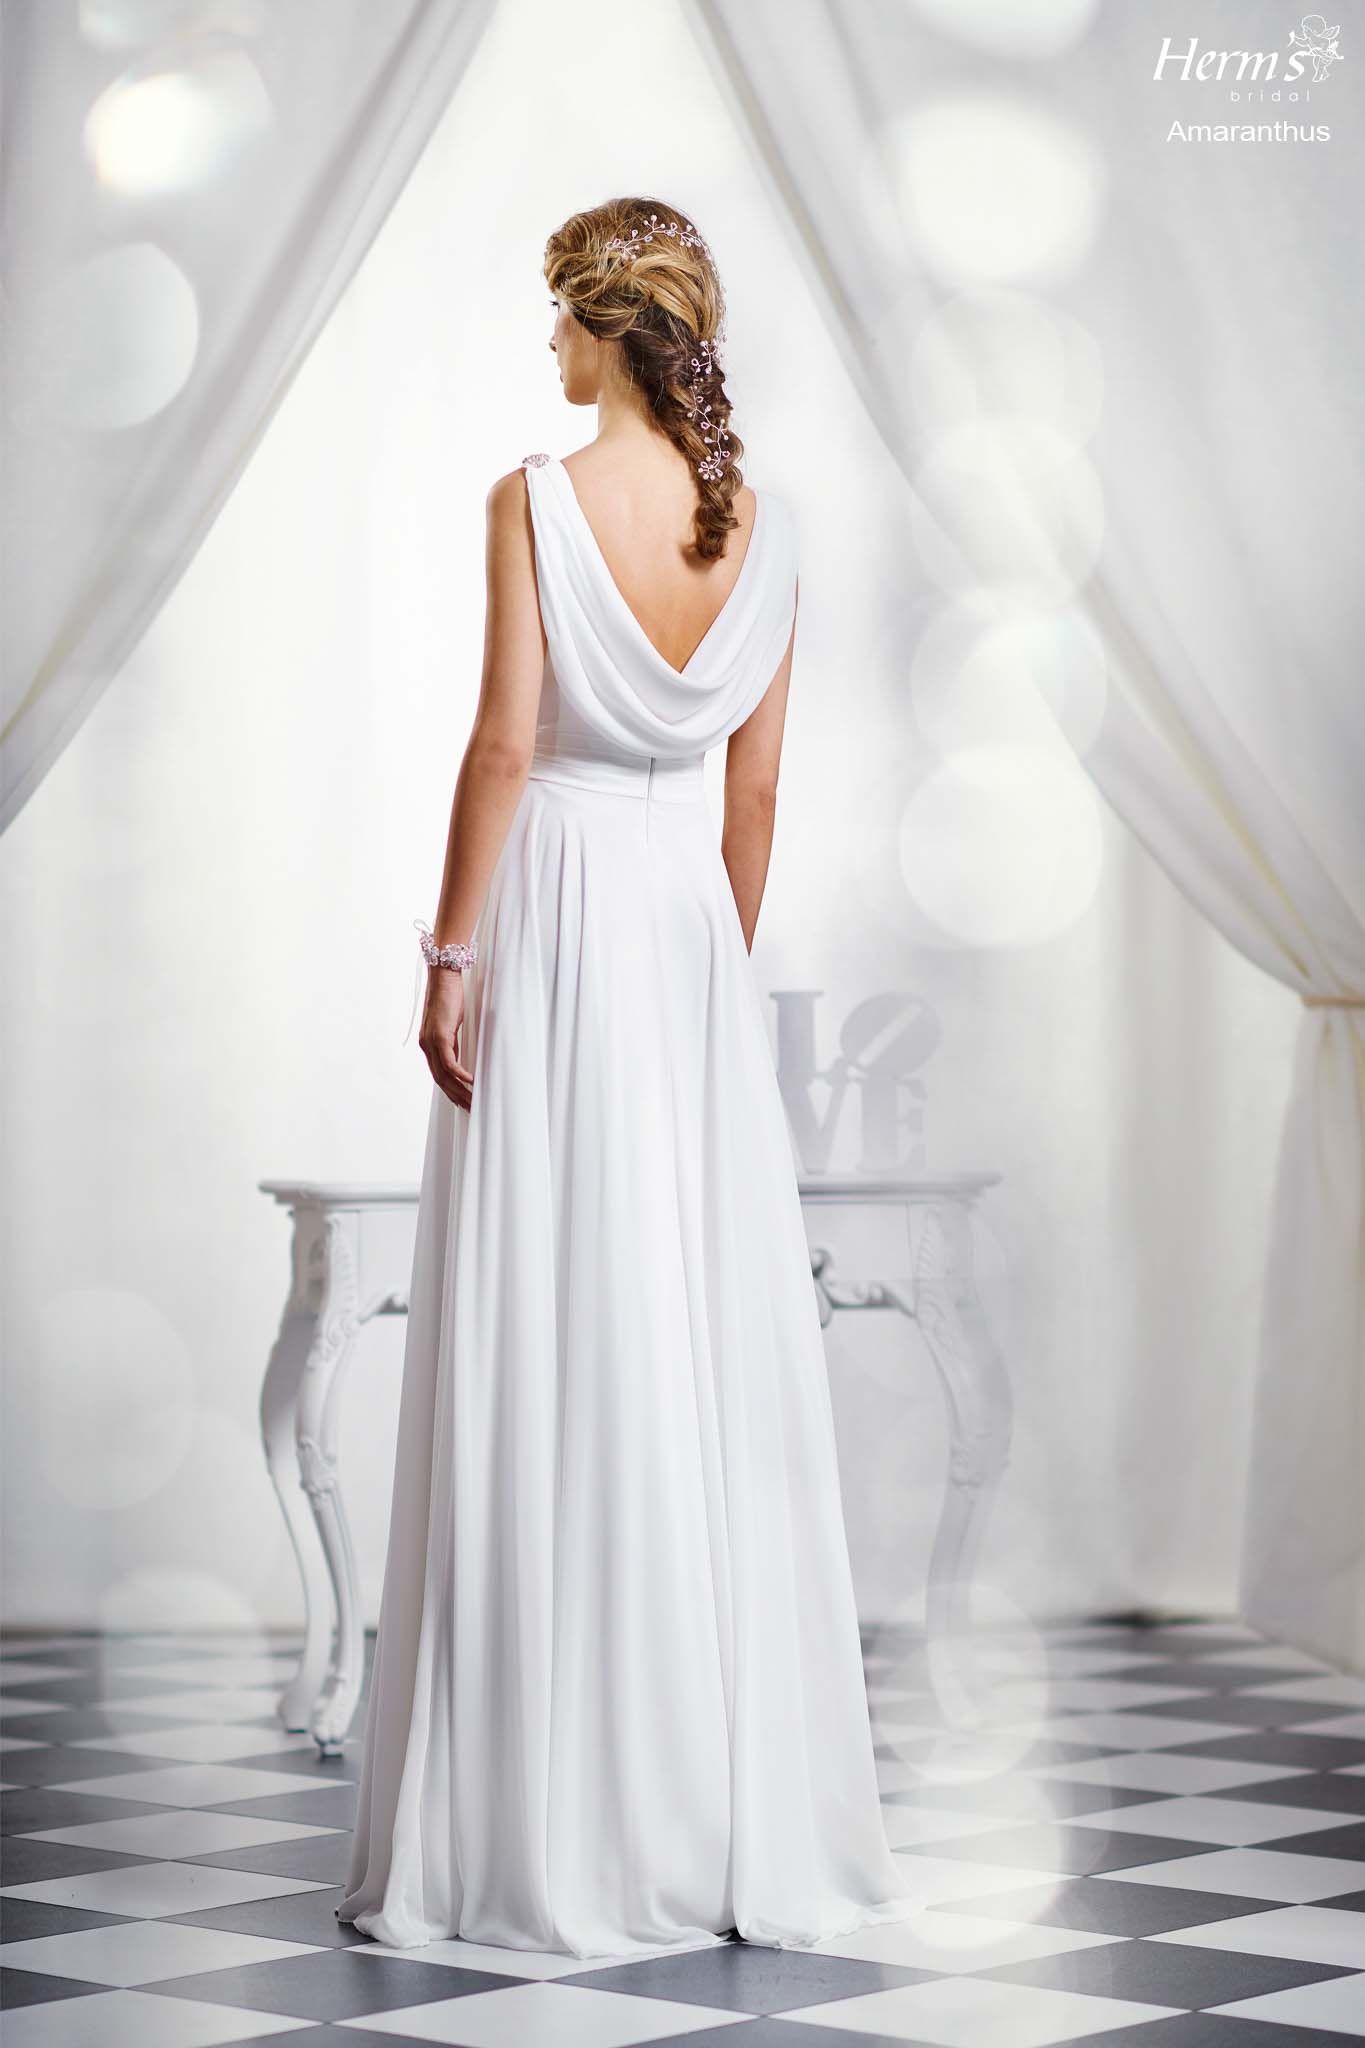 wedding dress Herm's Bridal Amaranthus